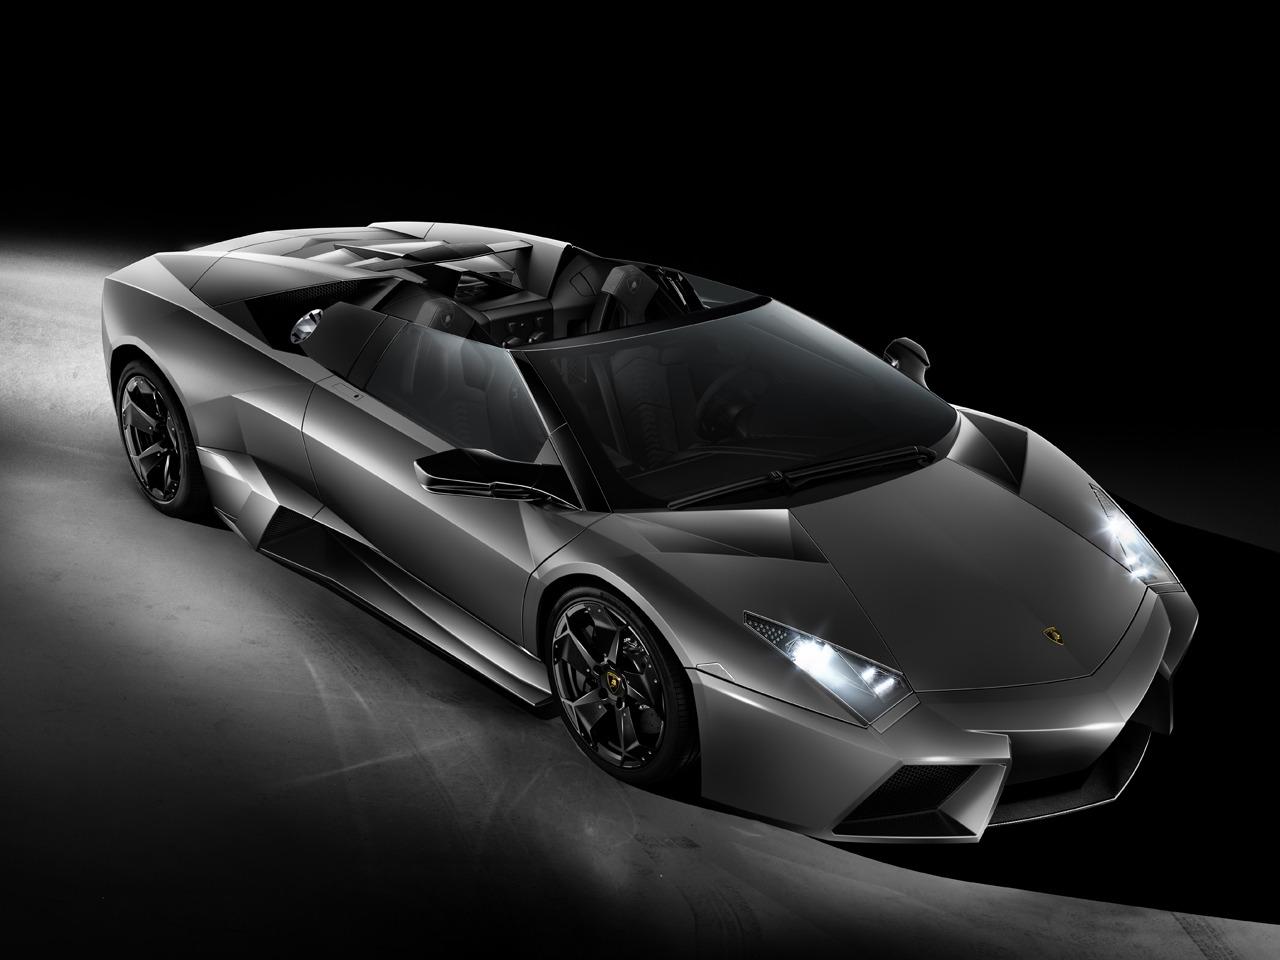 For Sale 2011 Lamborghini Reventon Roadster in the UK  GTspirit